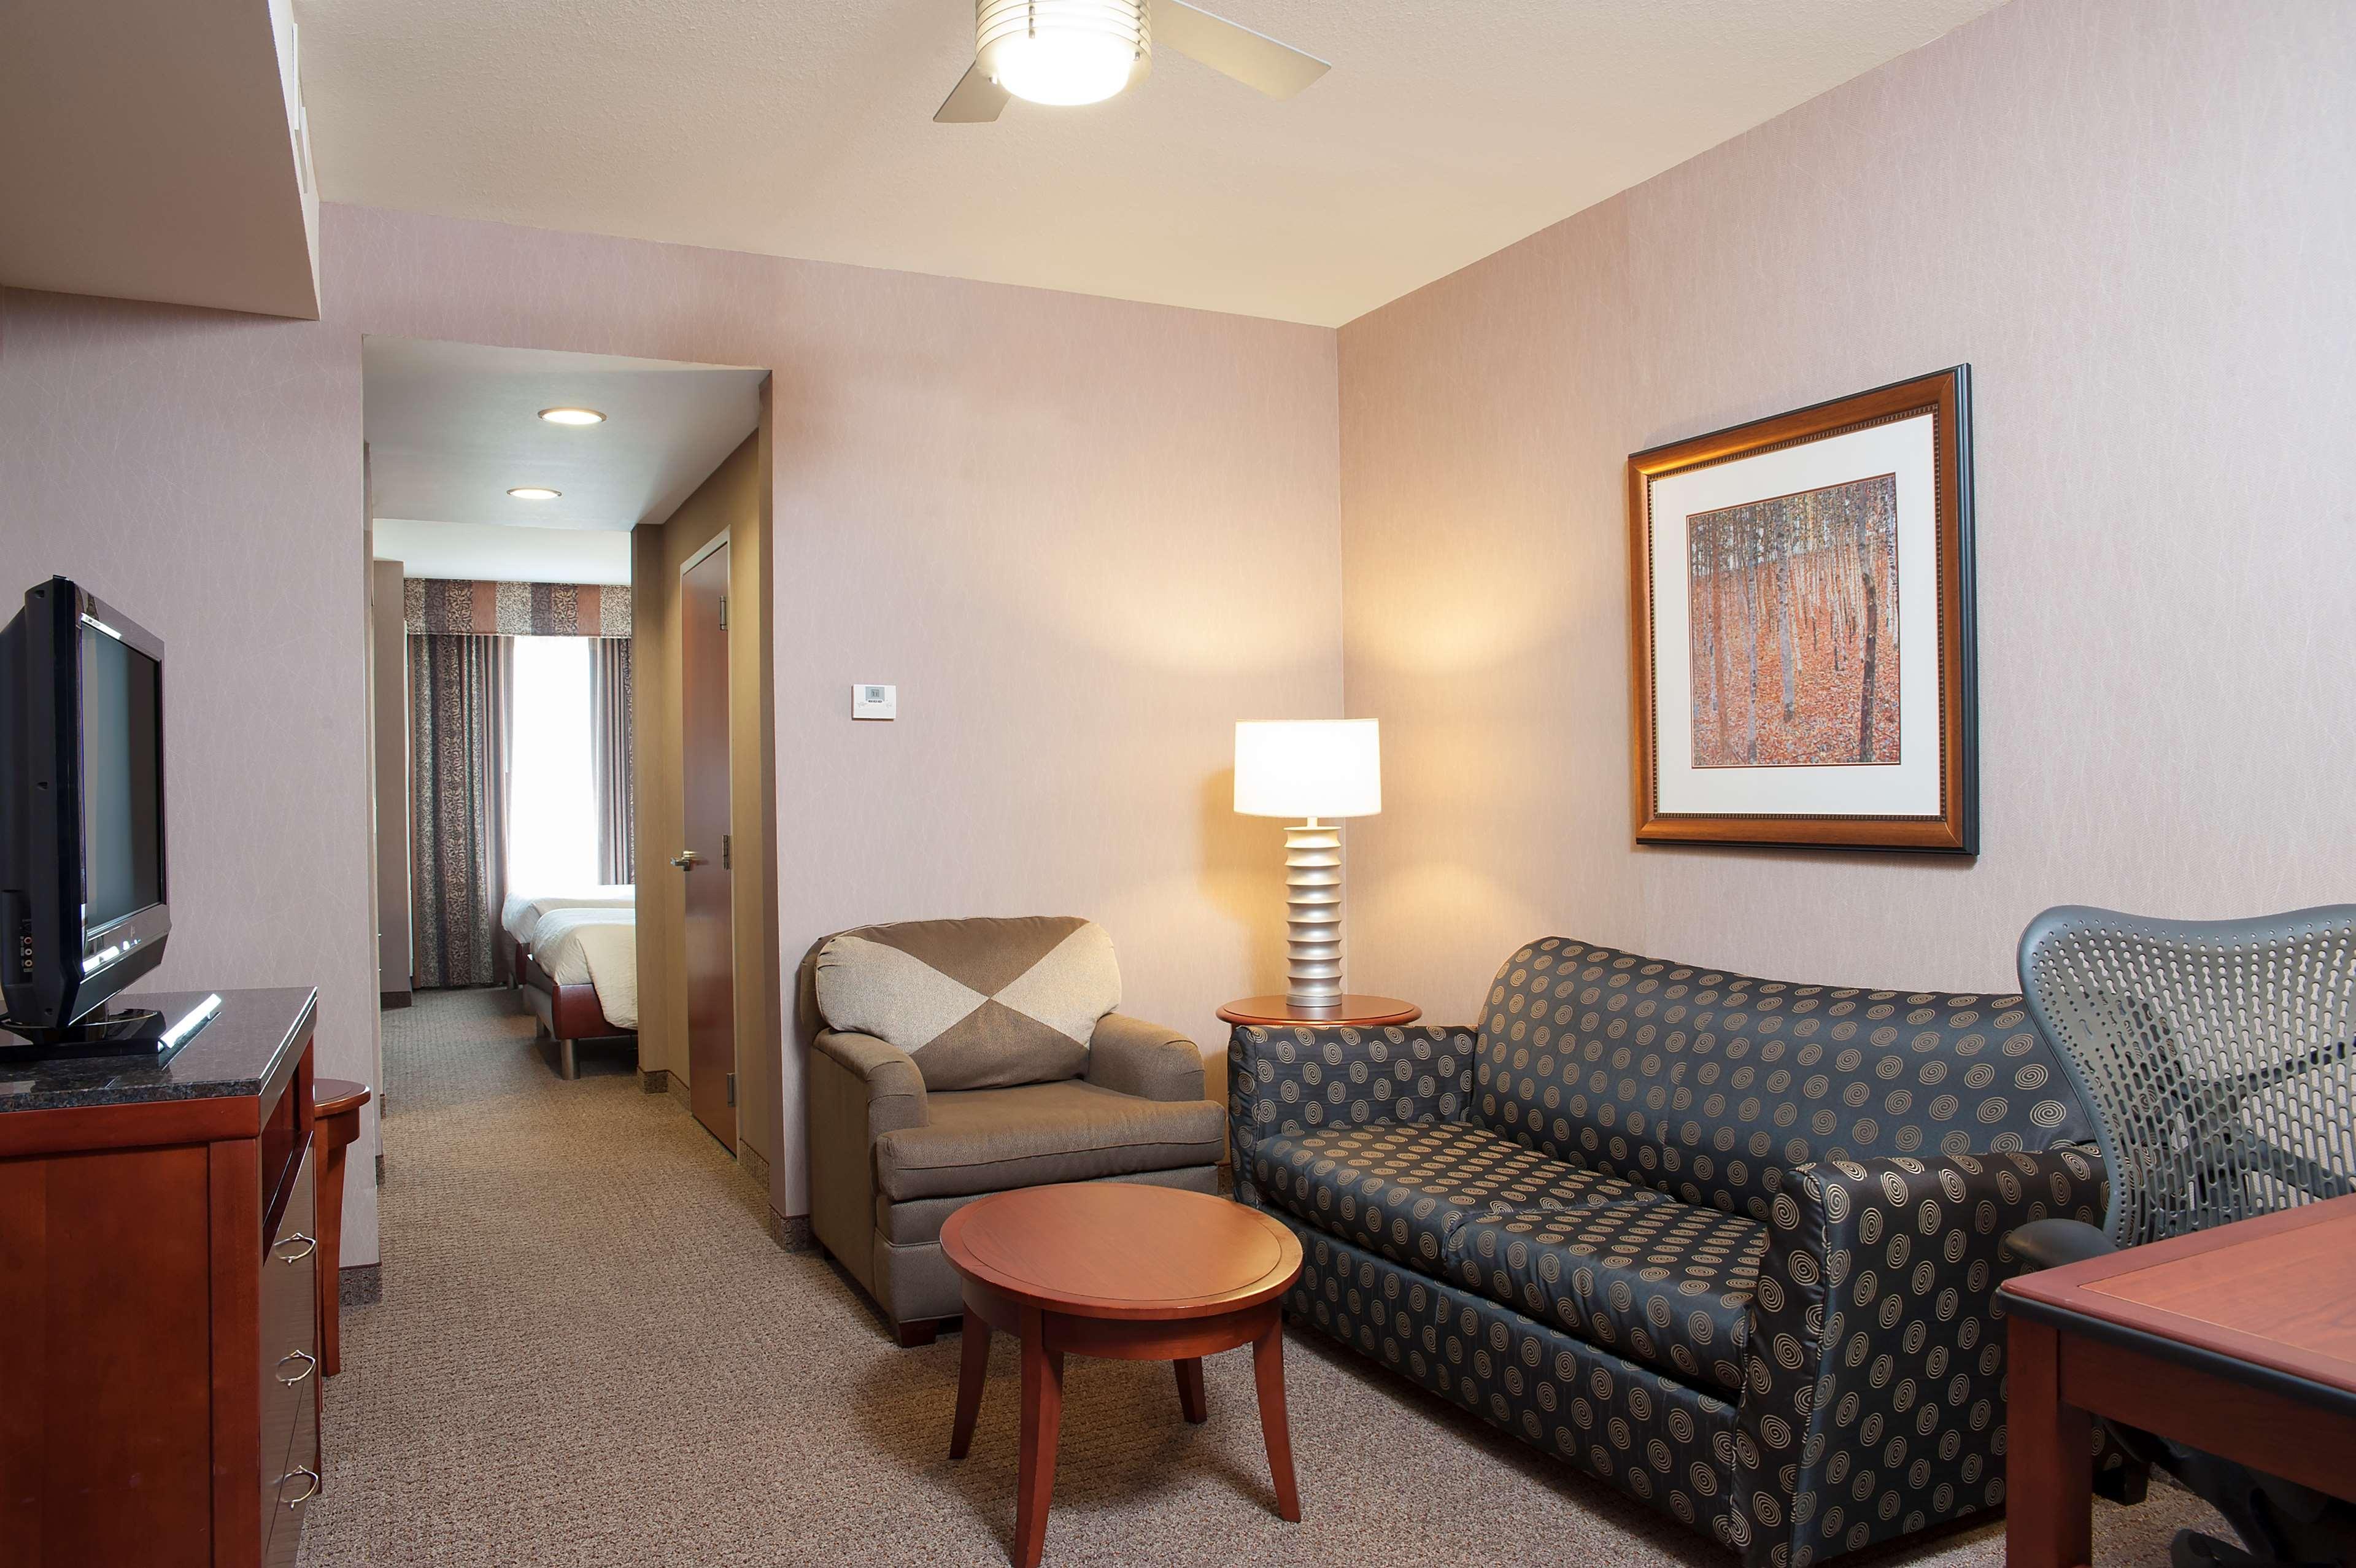 Hilton Garden Inn Indianapolis South/Greenwood image 16